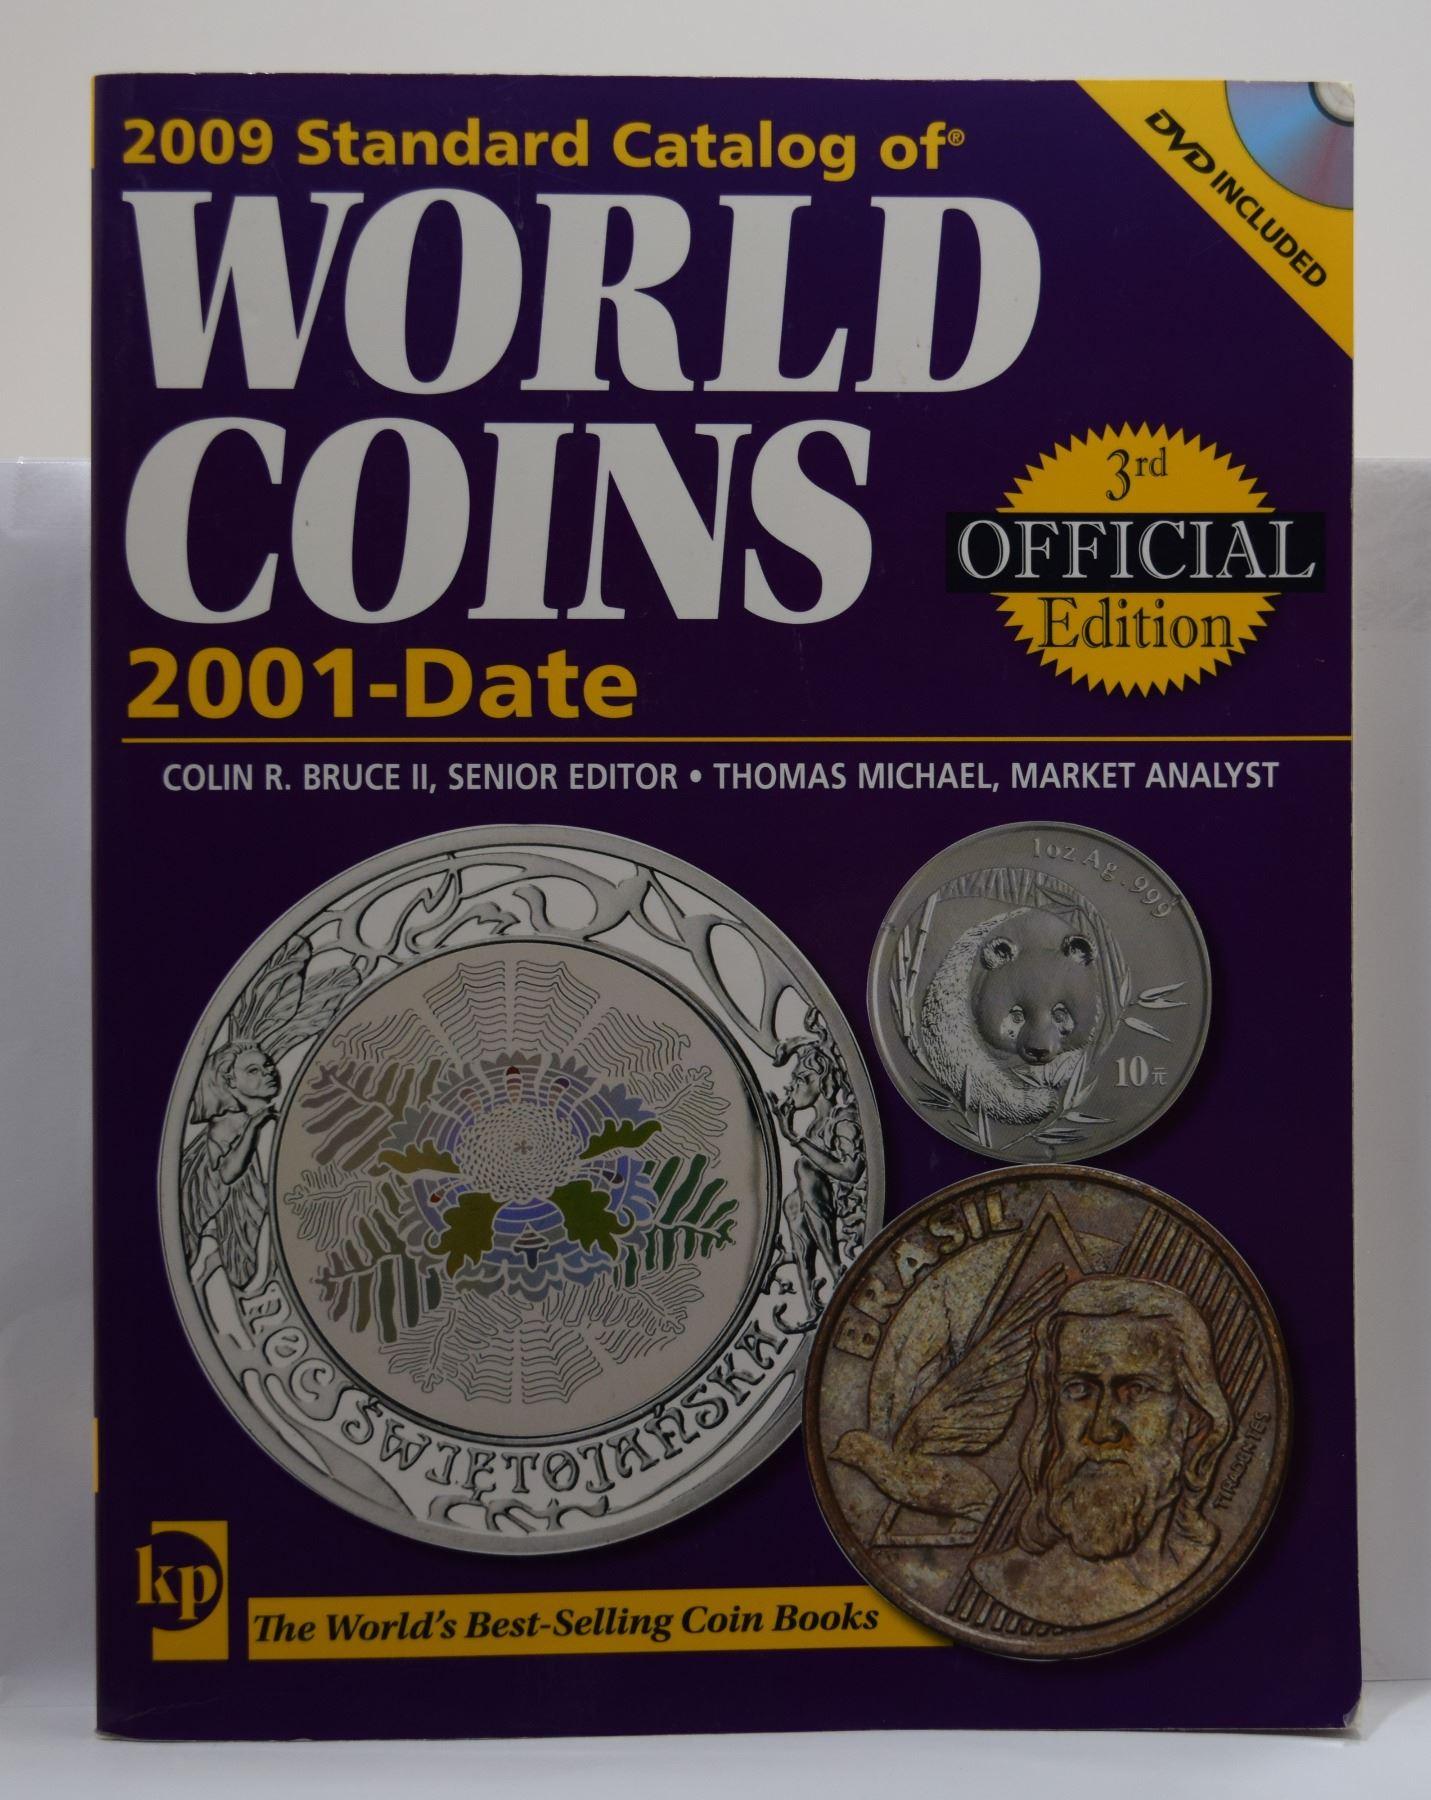 Bruce: Standard Catalog of World Coins 2001 - Date